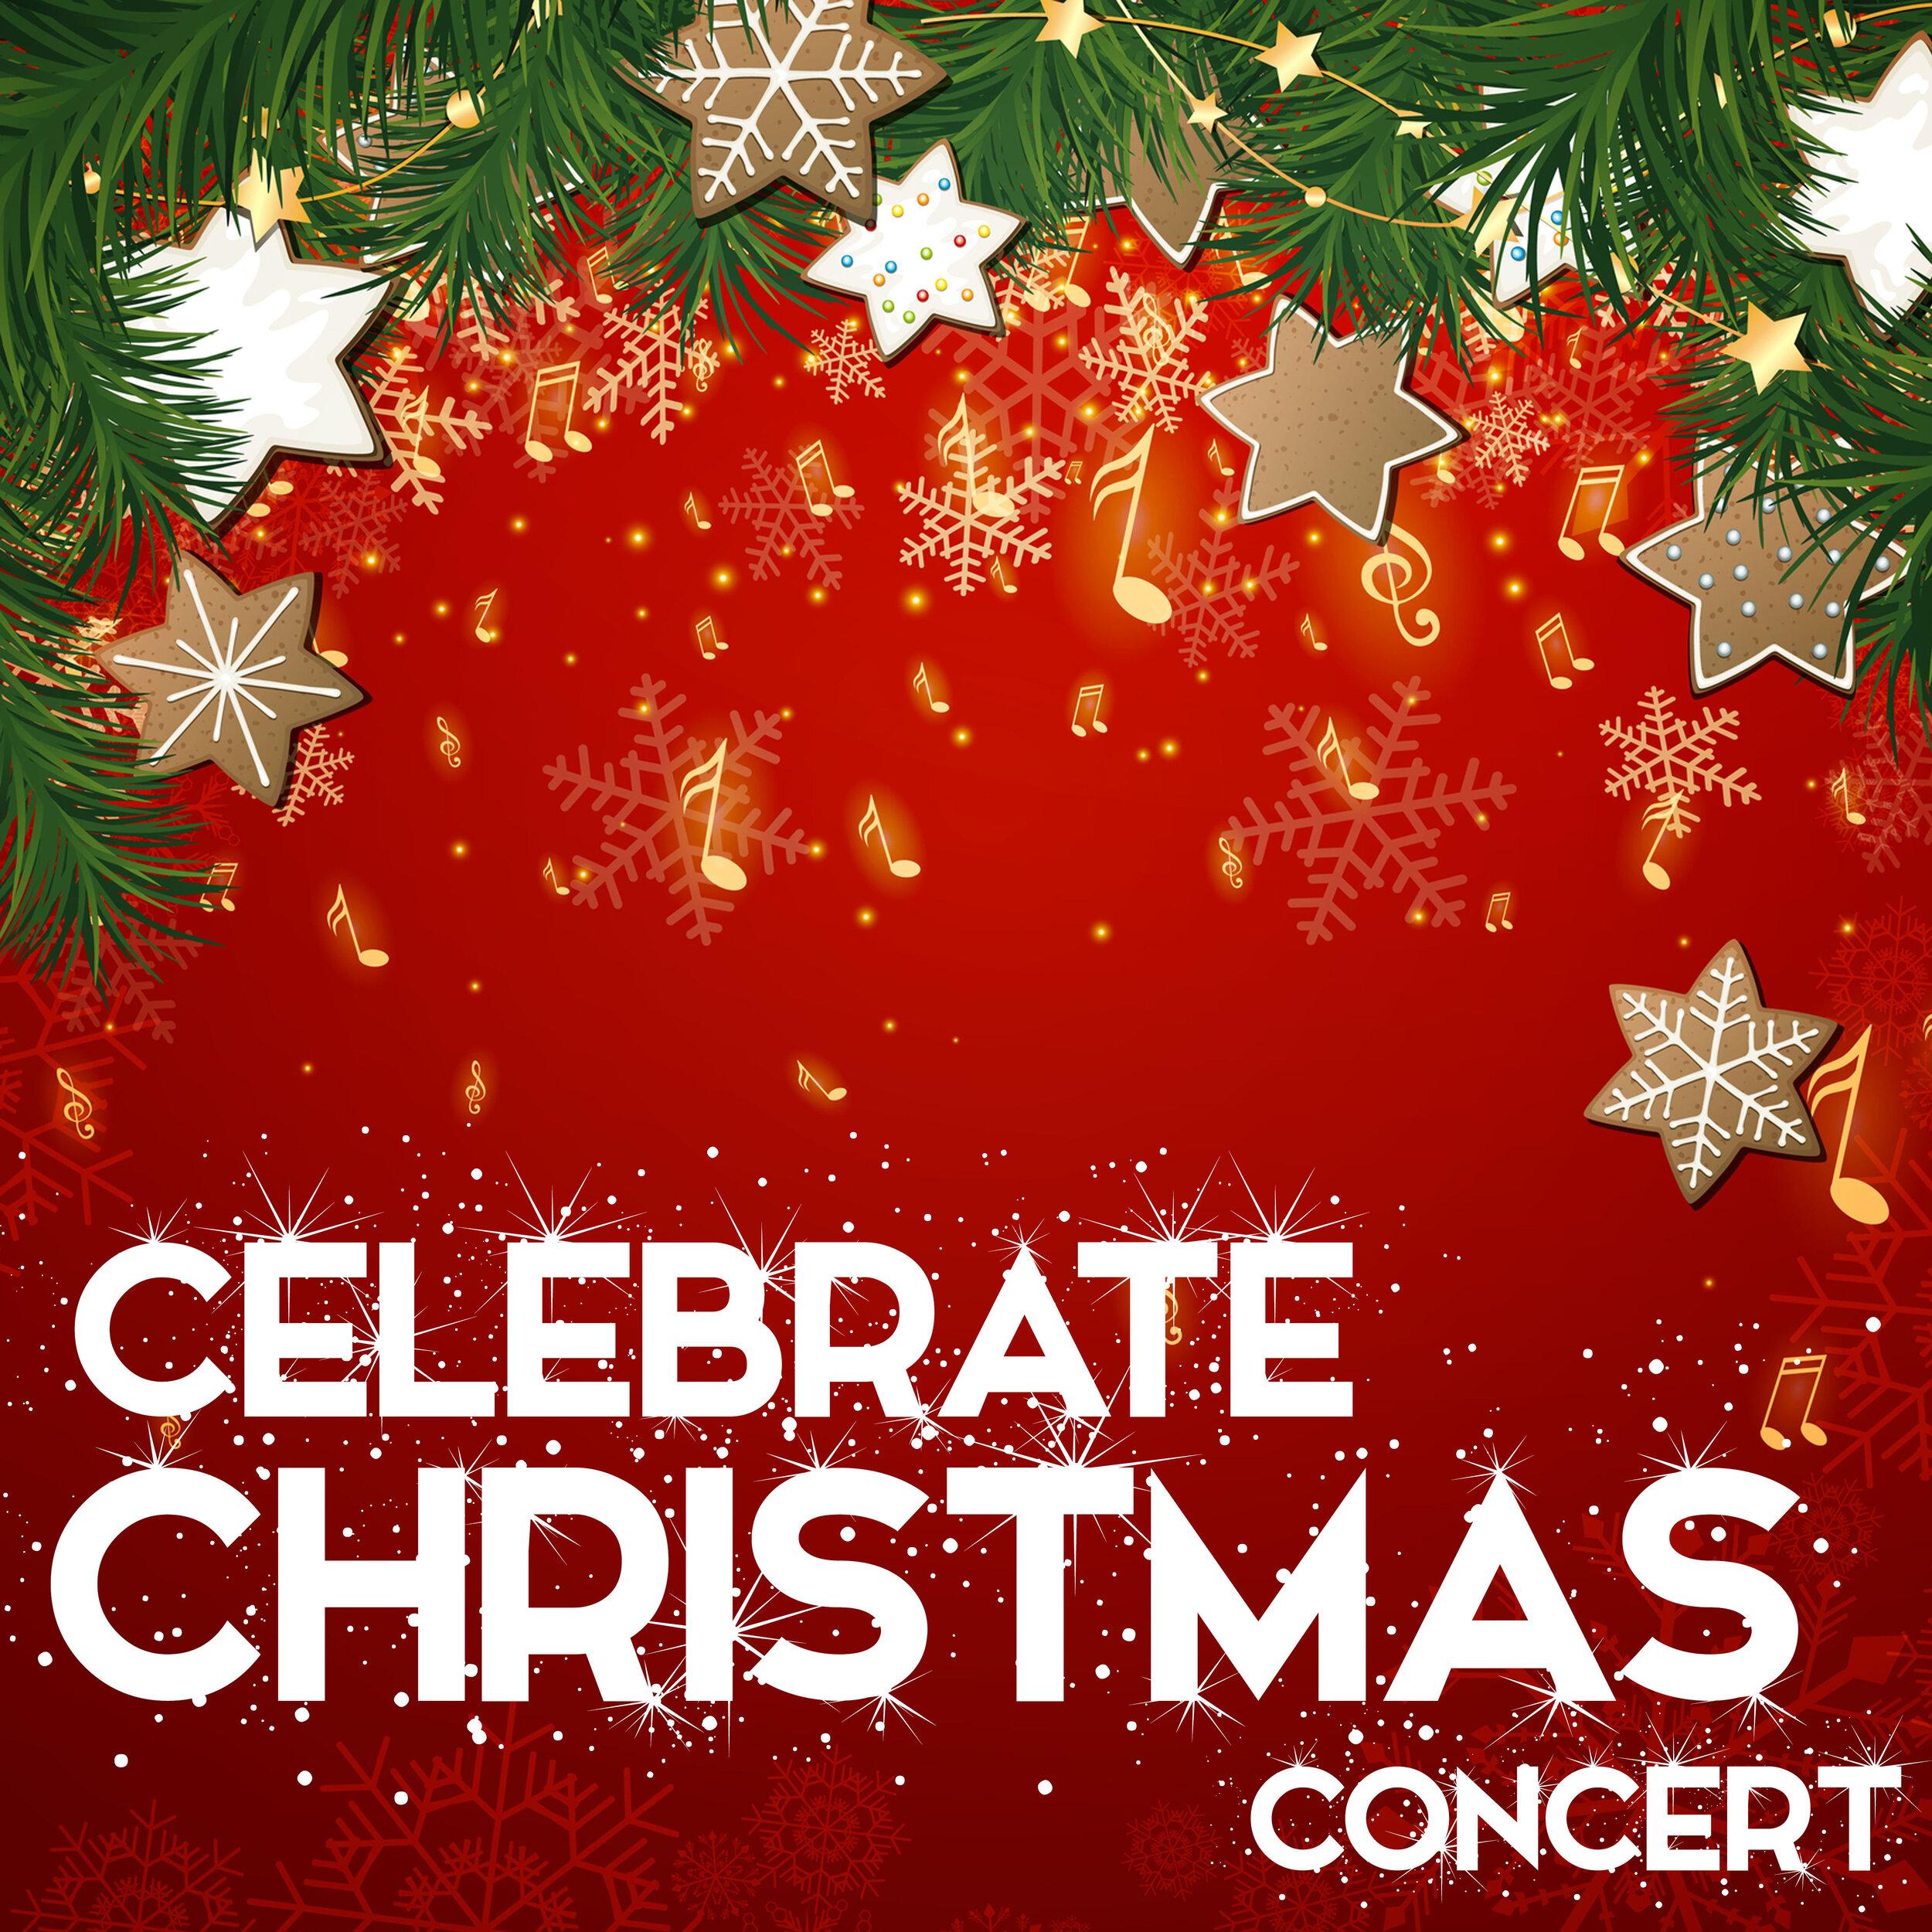 Celebrate Christmas Logo.jpg